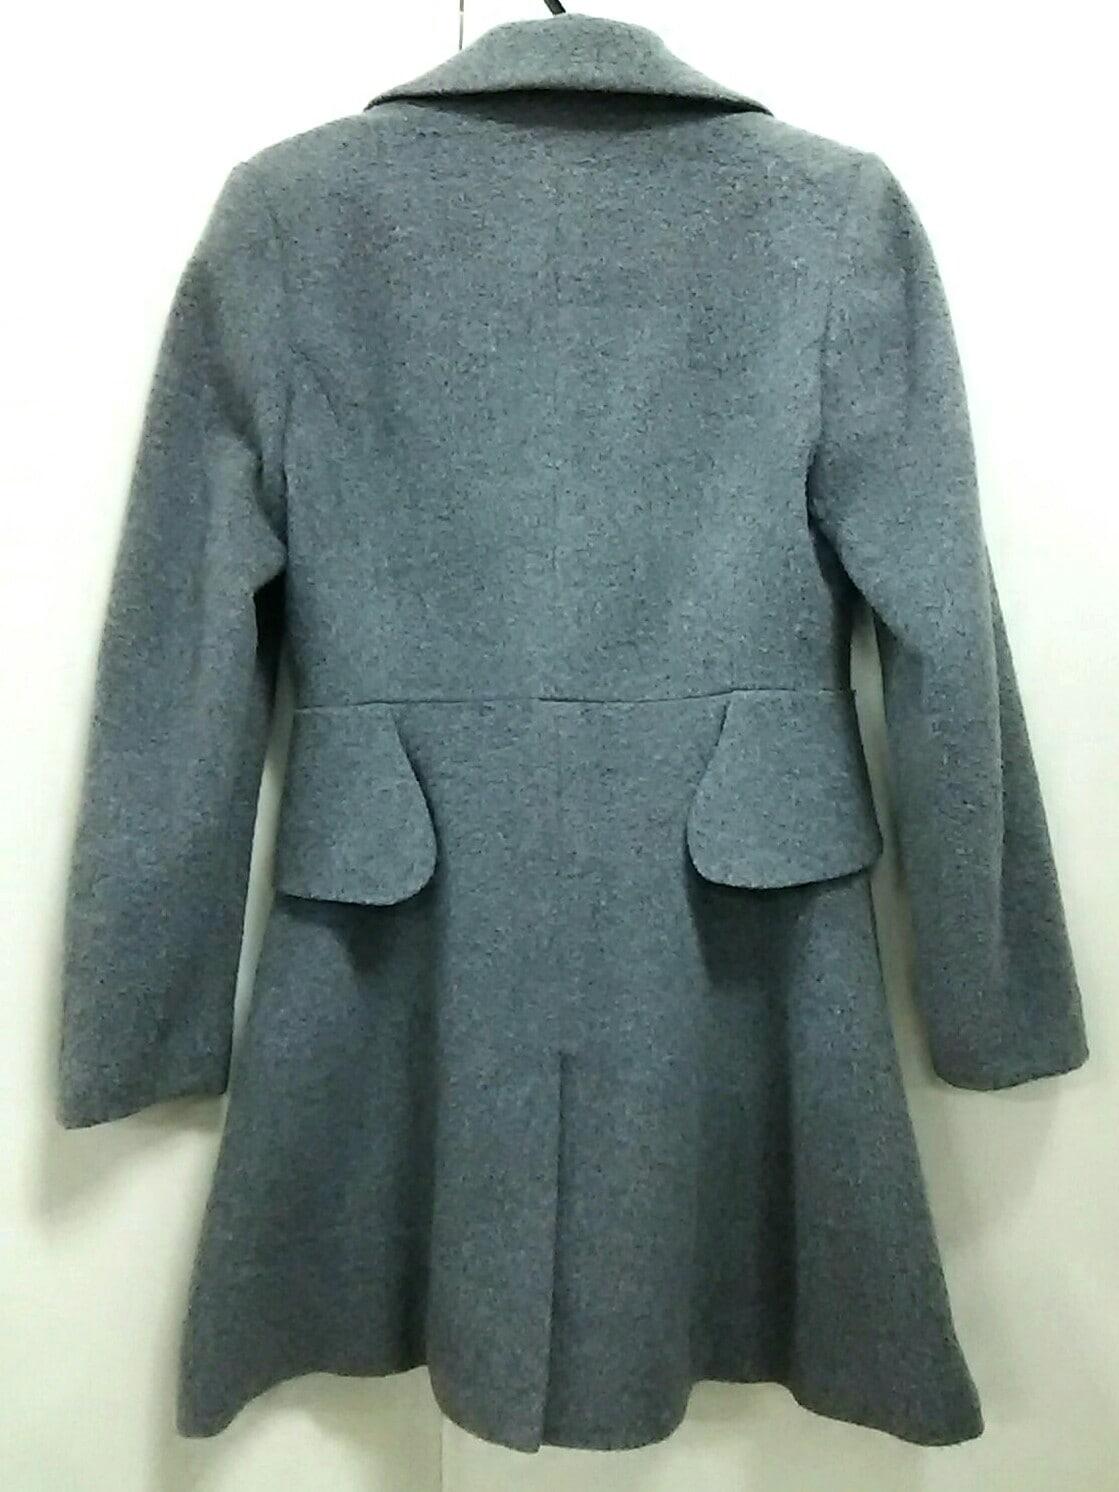 VivienneWestwoodRedLabel(ヴィヴィアンウエストウッドレッドレーベル)のコート